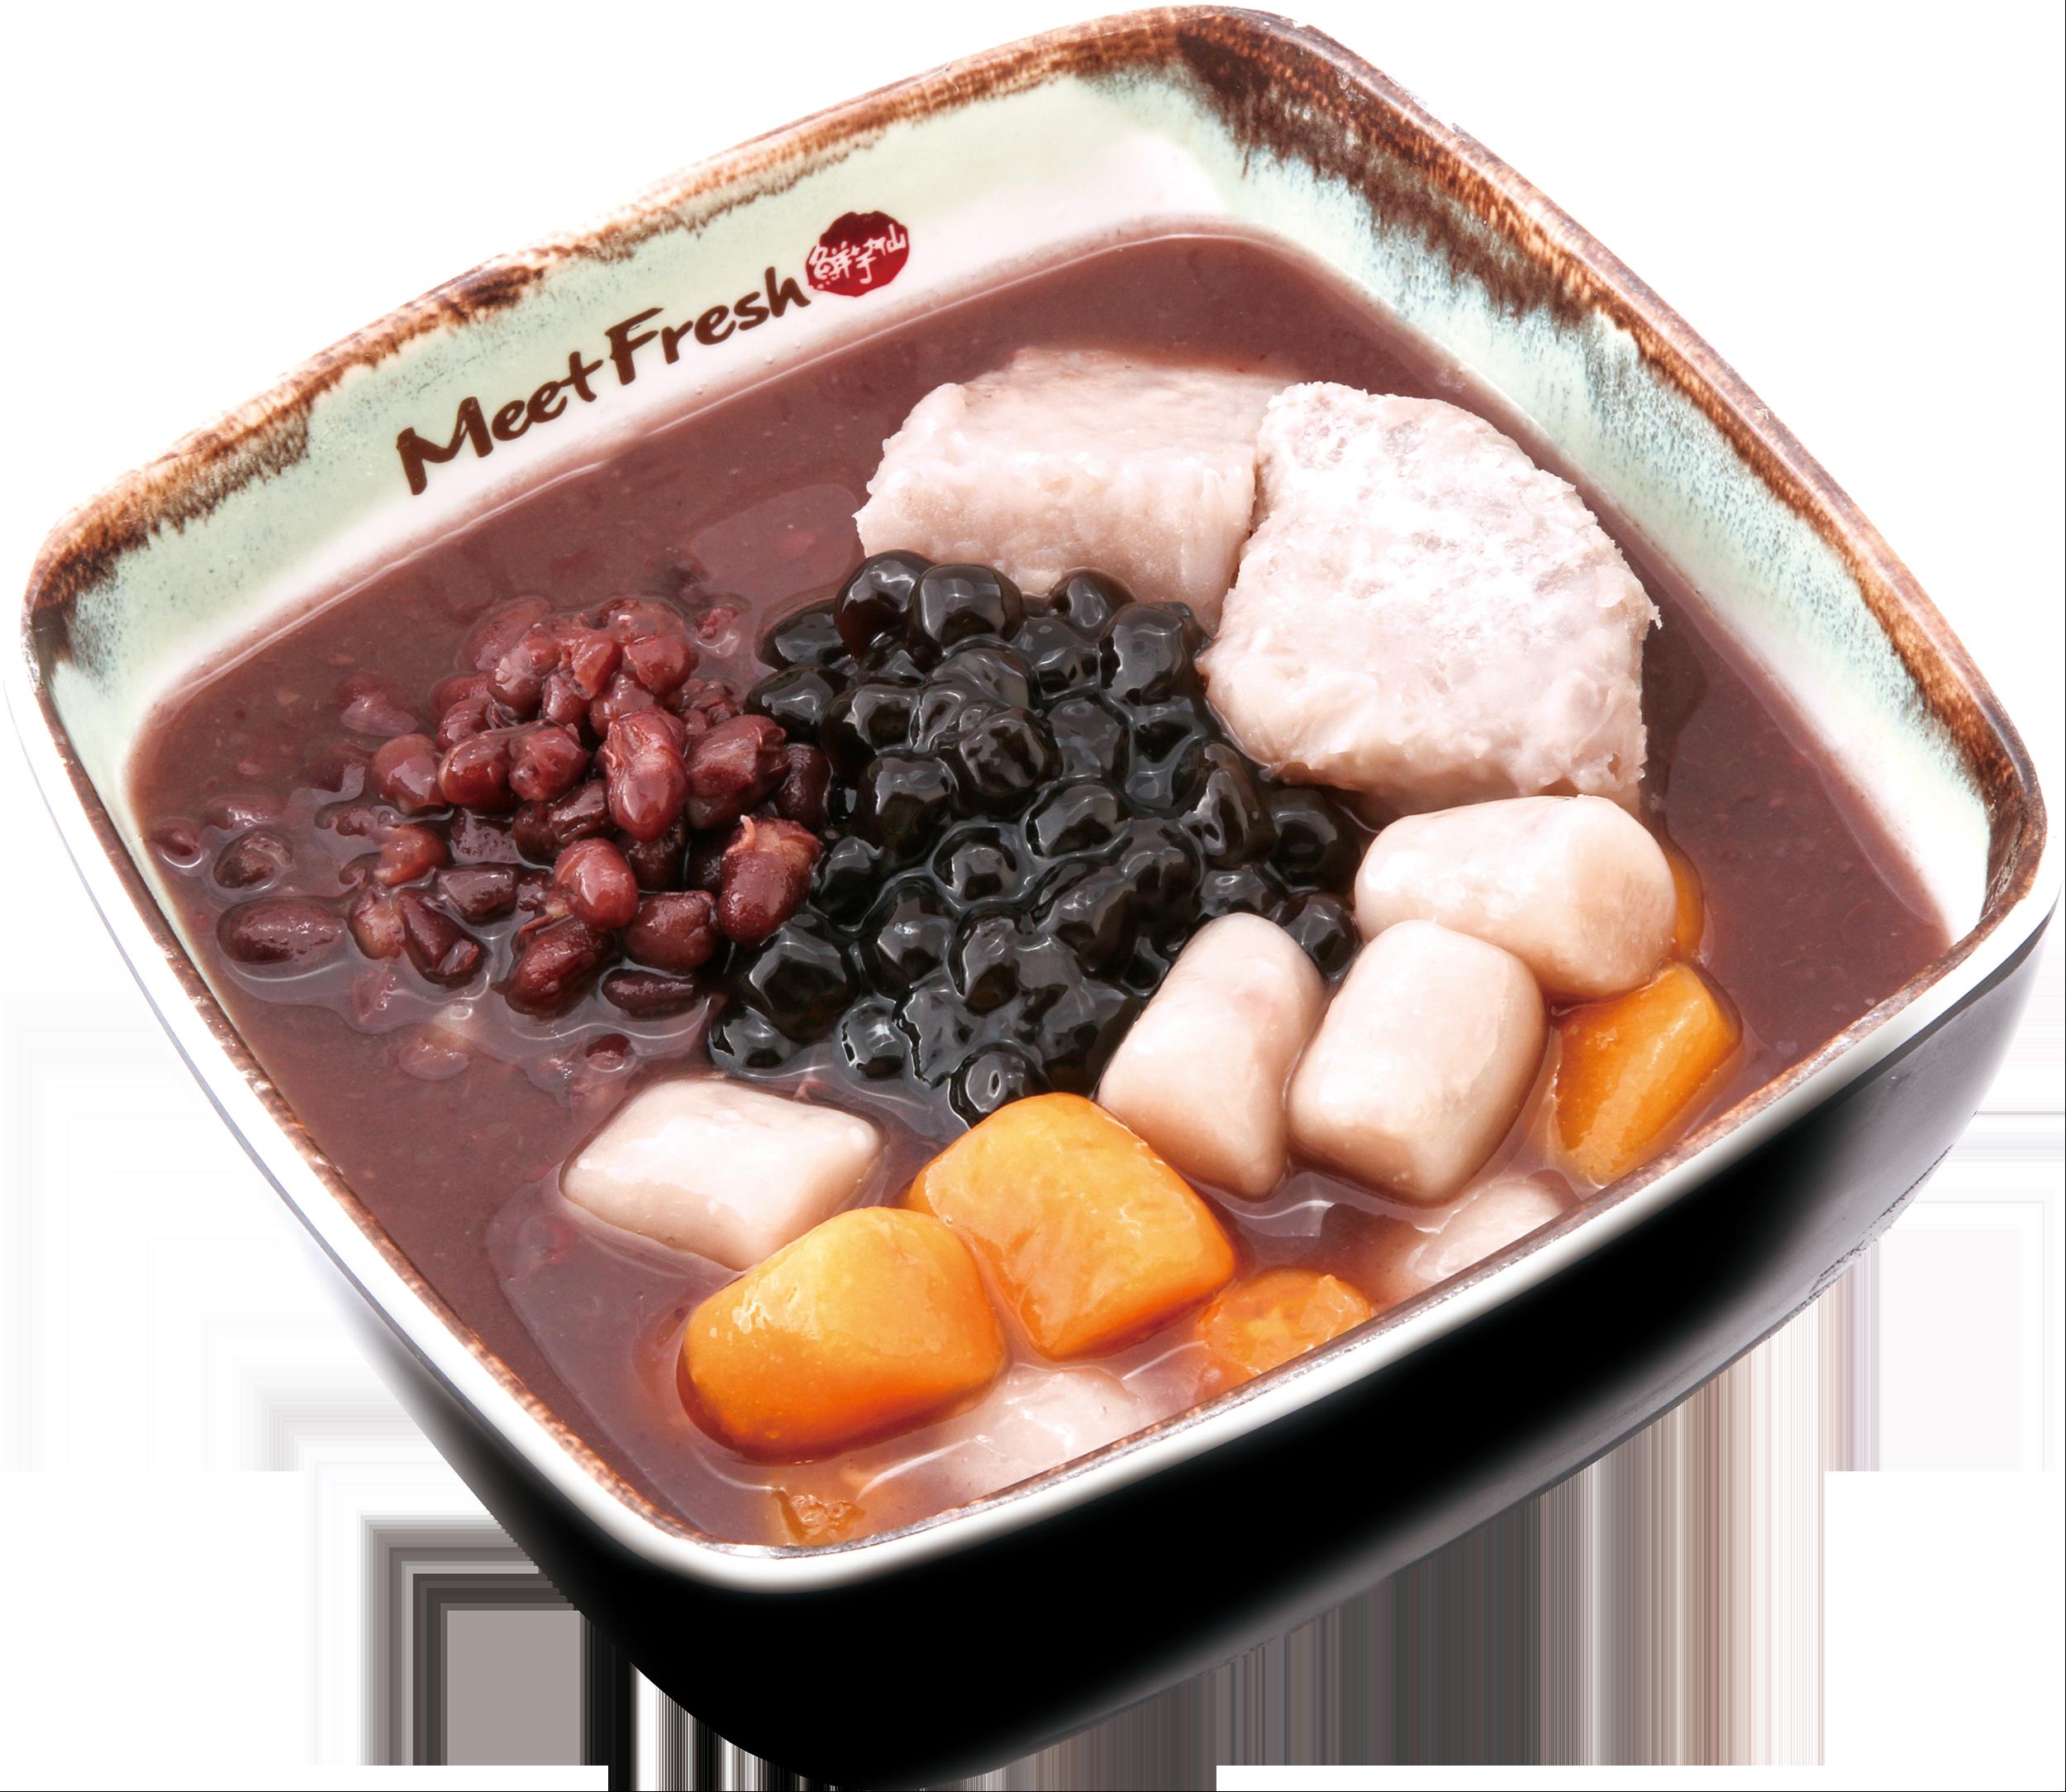 Hot Red Bean Soup Combo B - Taro, Red Beans, Boba, Taro Balls, Hot Red Bean Soup